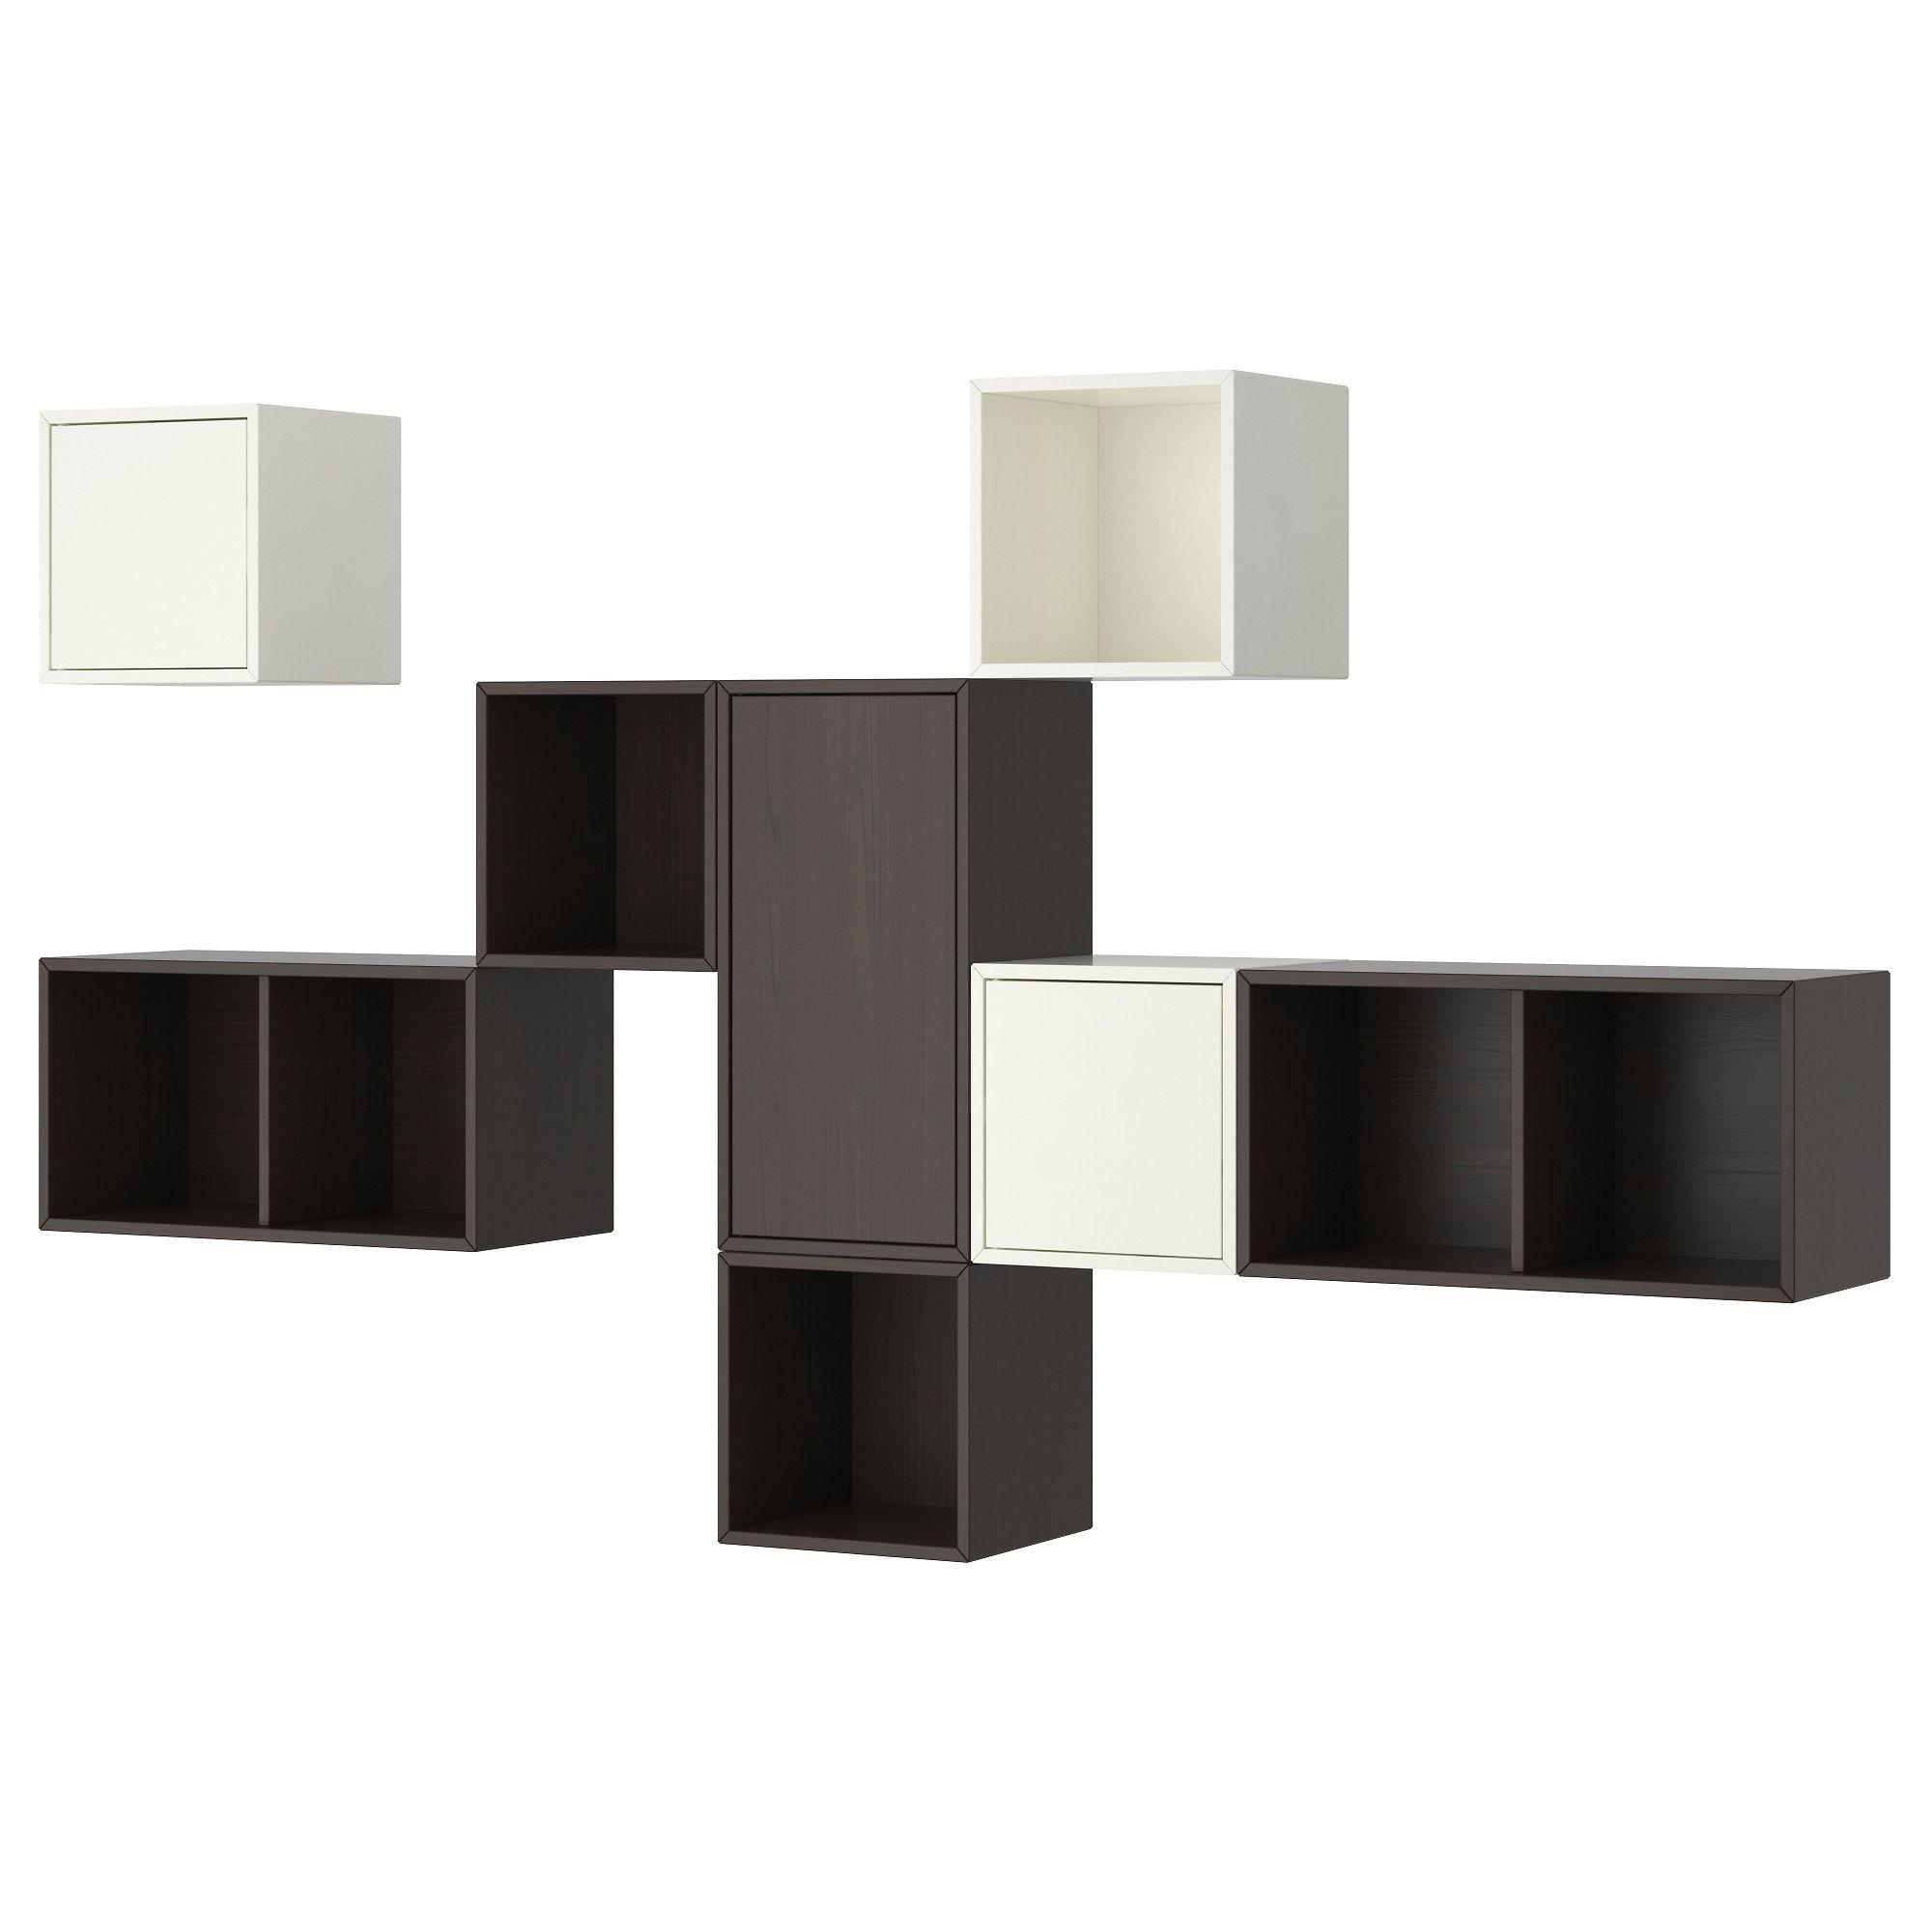 ikea wc good interesting ikea kullarna wcbril with ikea. Black Bedroom Furniture Sets. Home Design Ideas